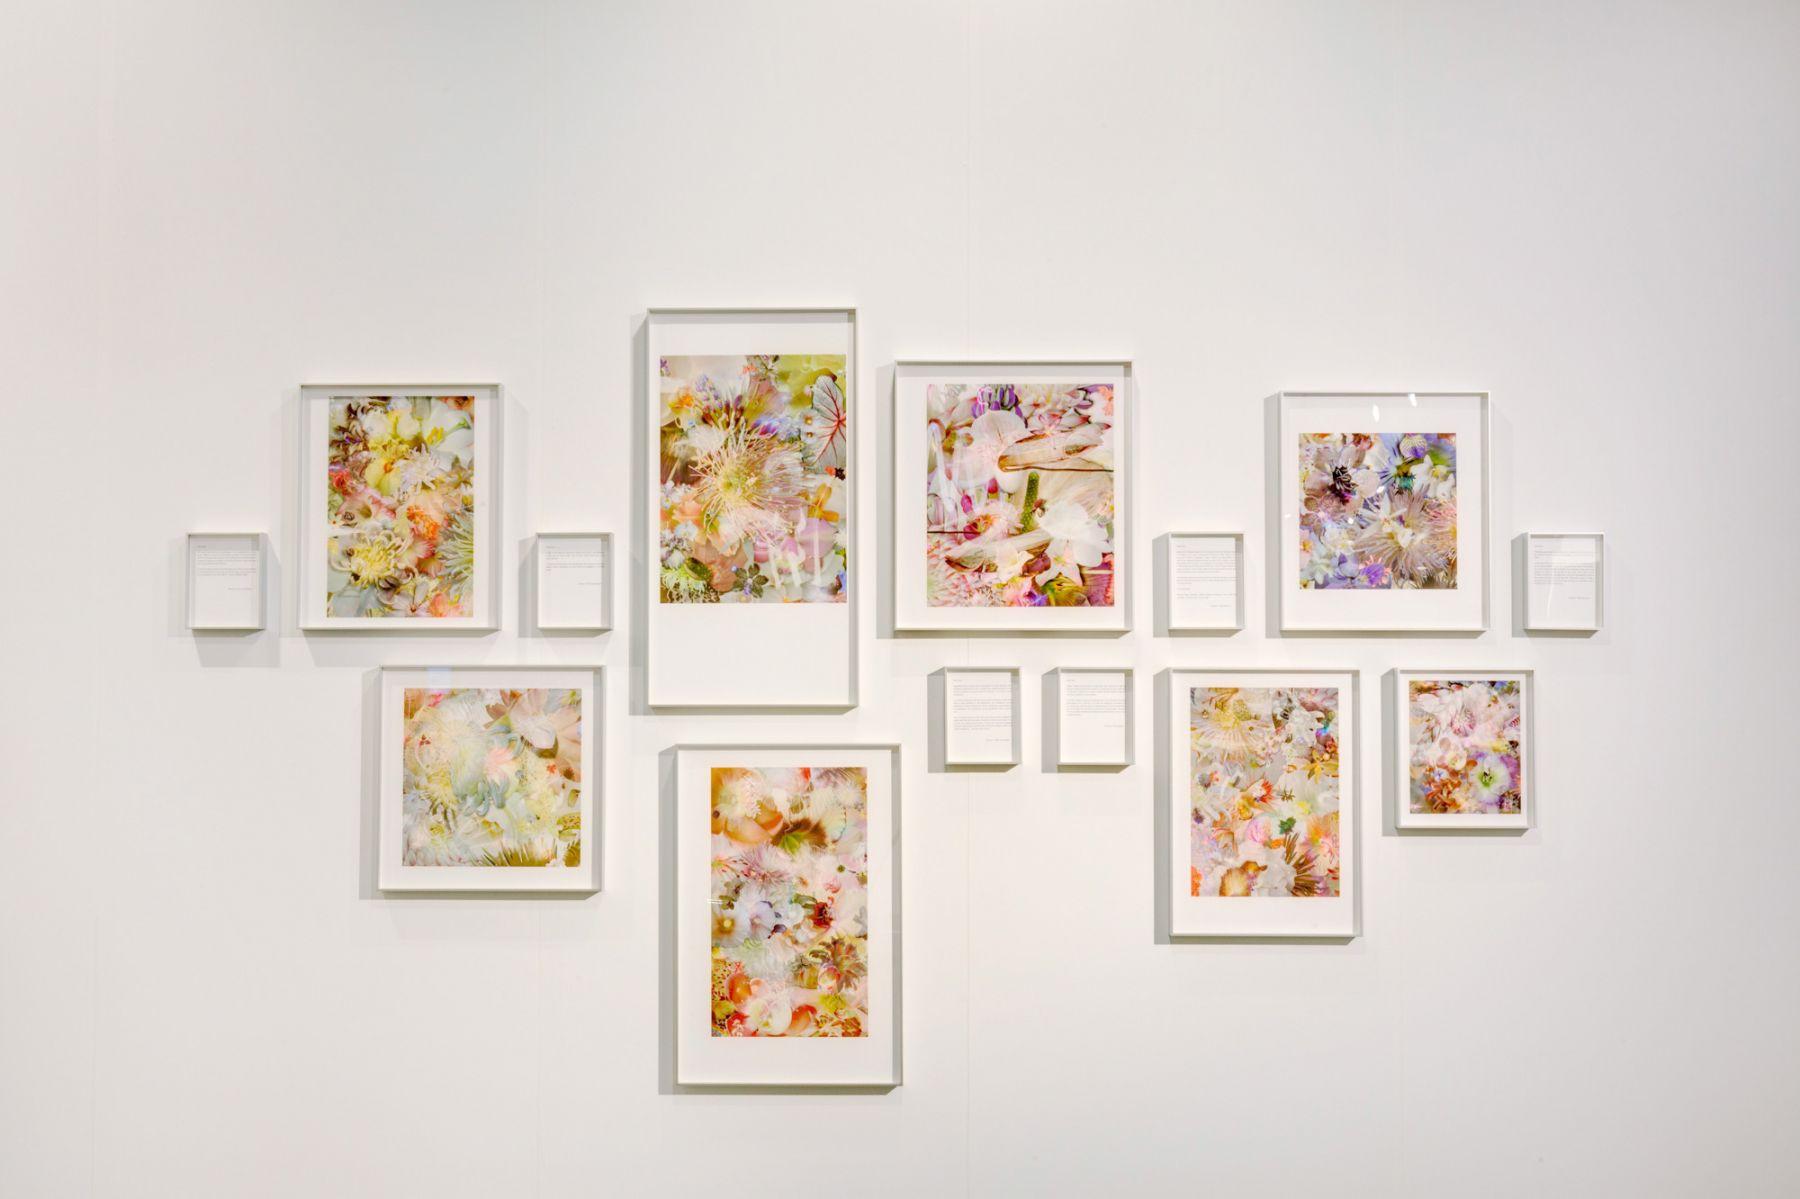 Liu Shiyuan Untitled, 2014